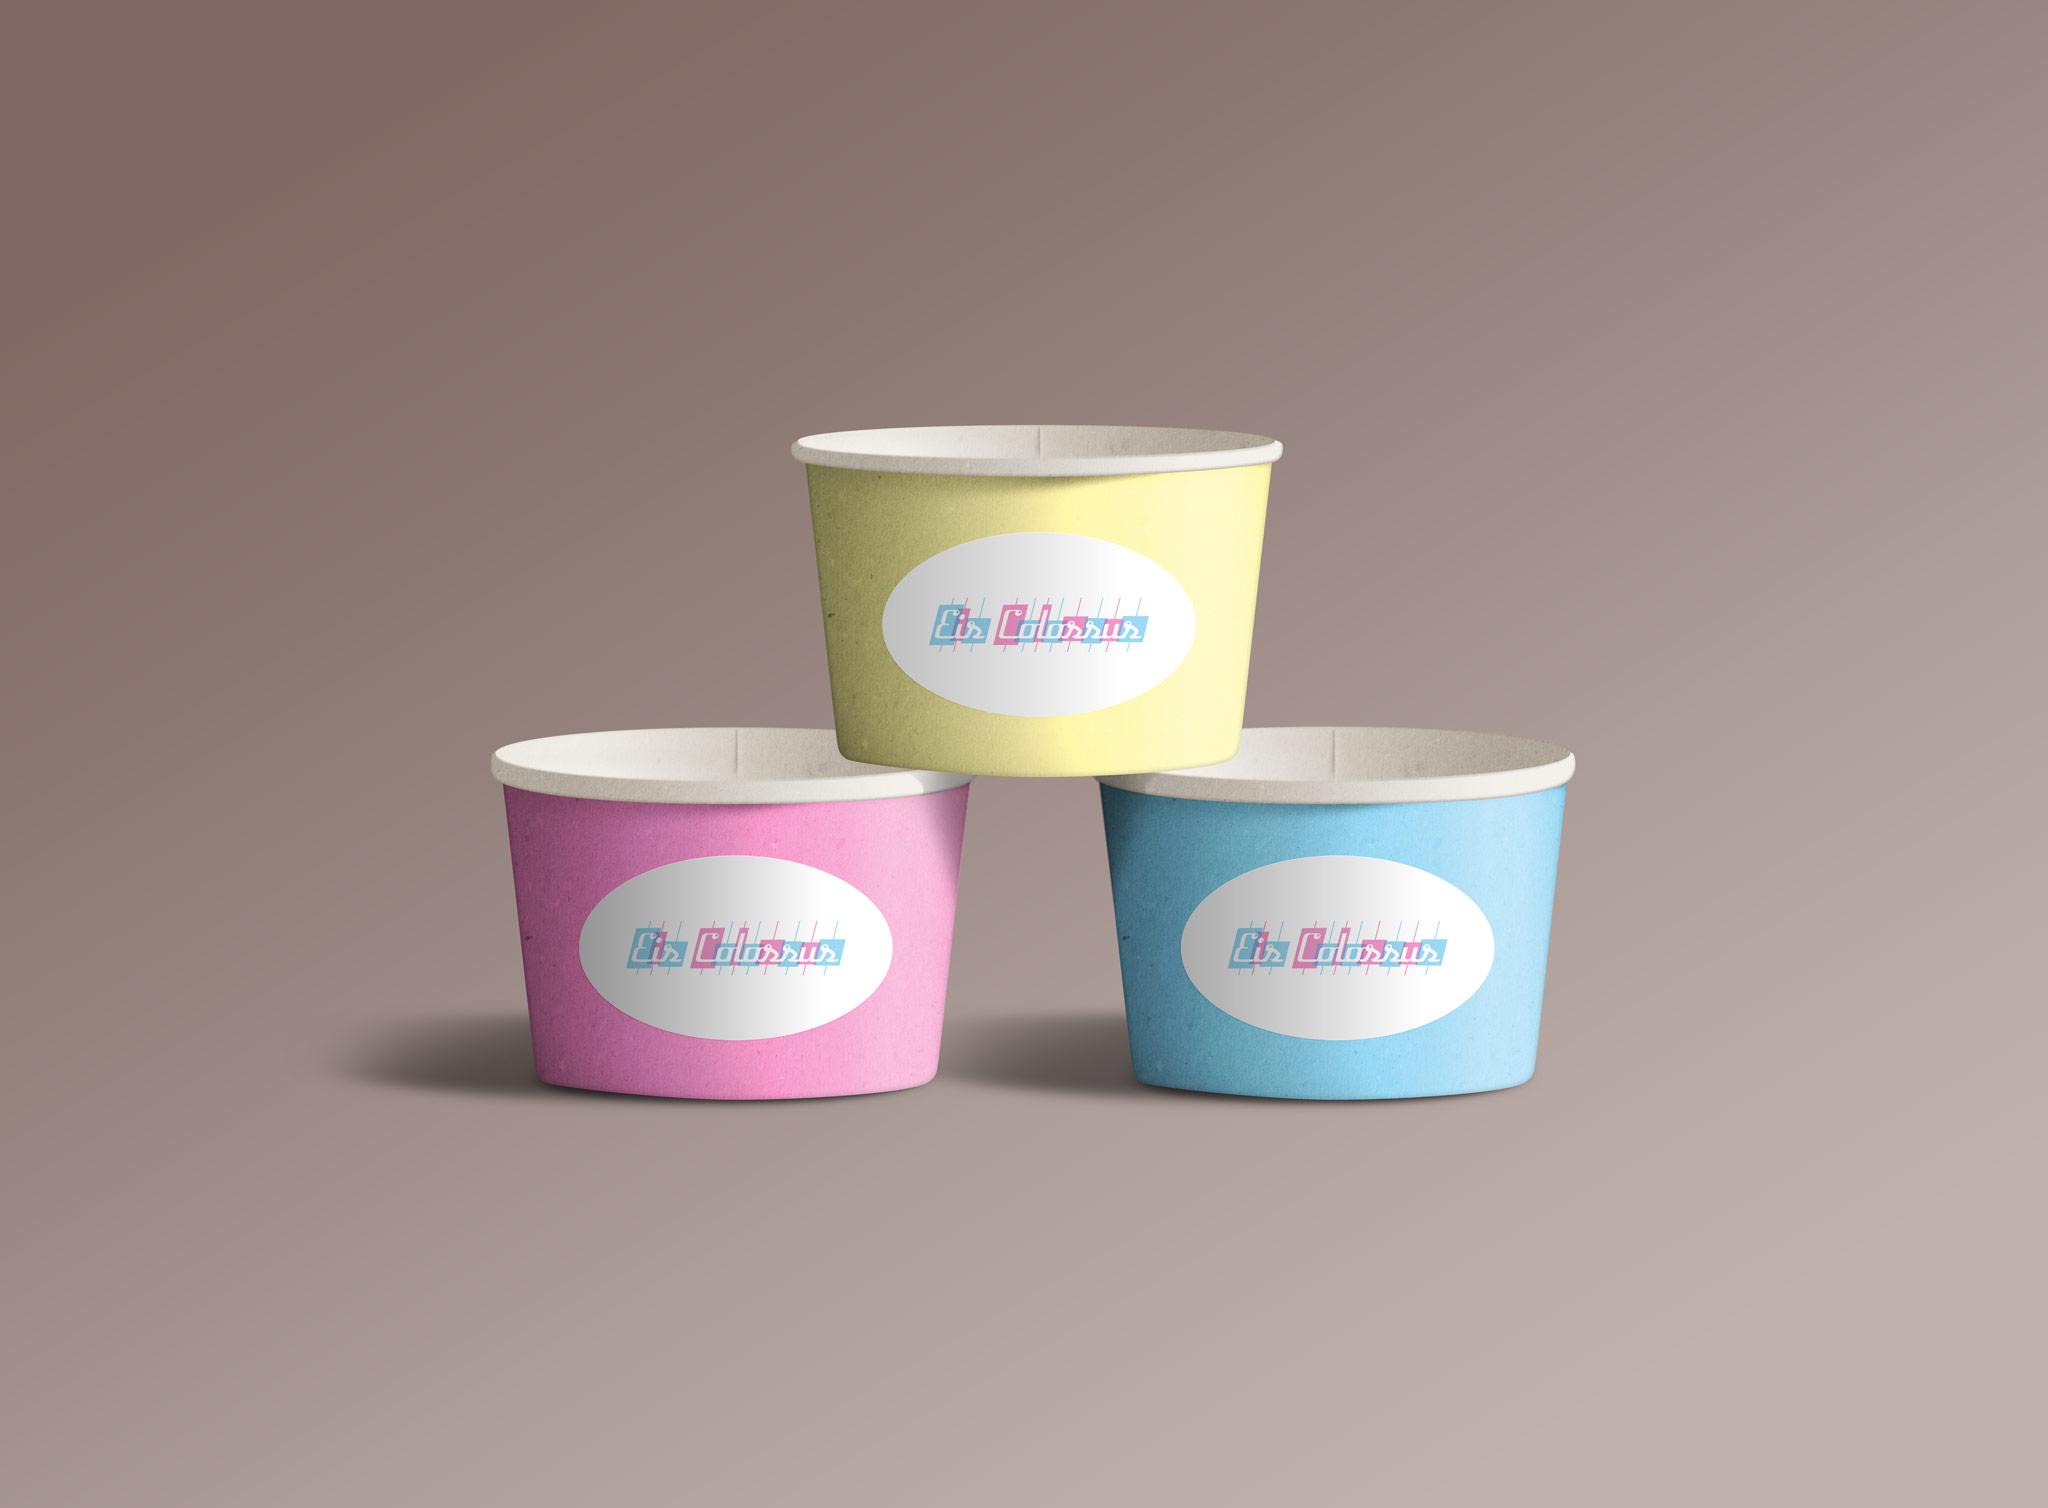 Eis Colossus Eisbecher Corporate Design Packaging Gesa Siebert Kommunikationsdesign